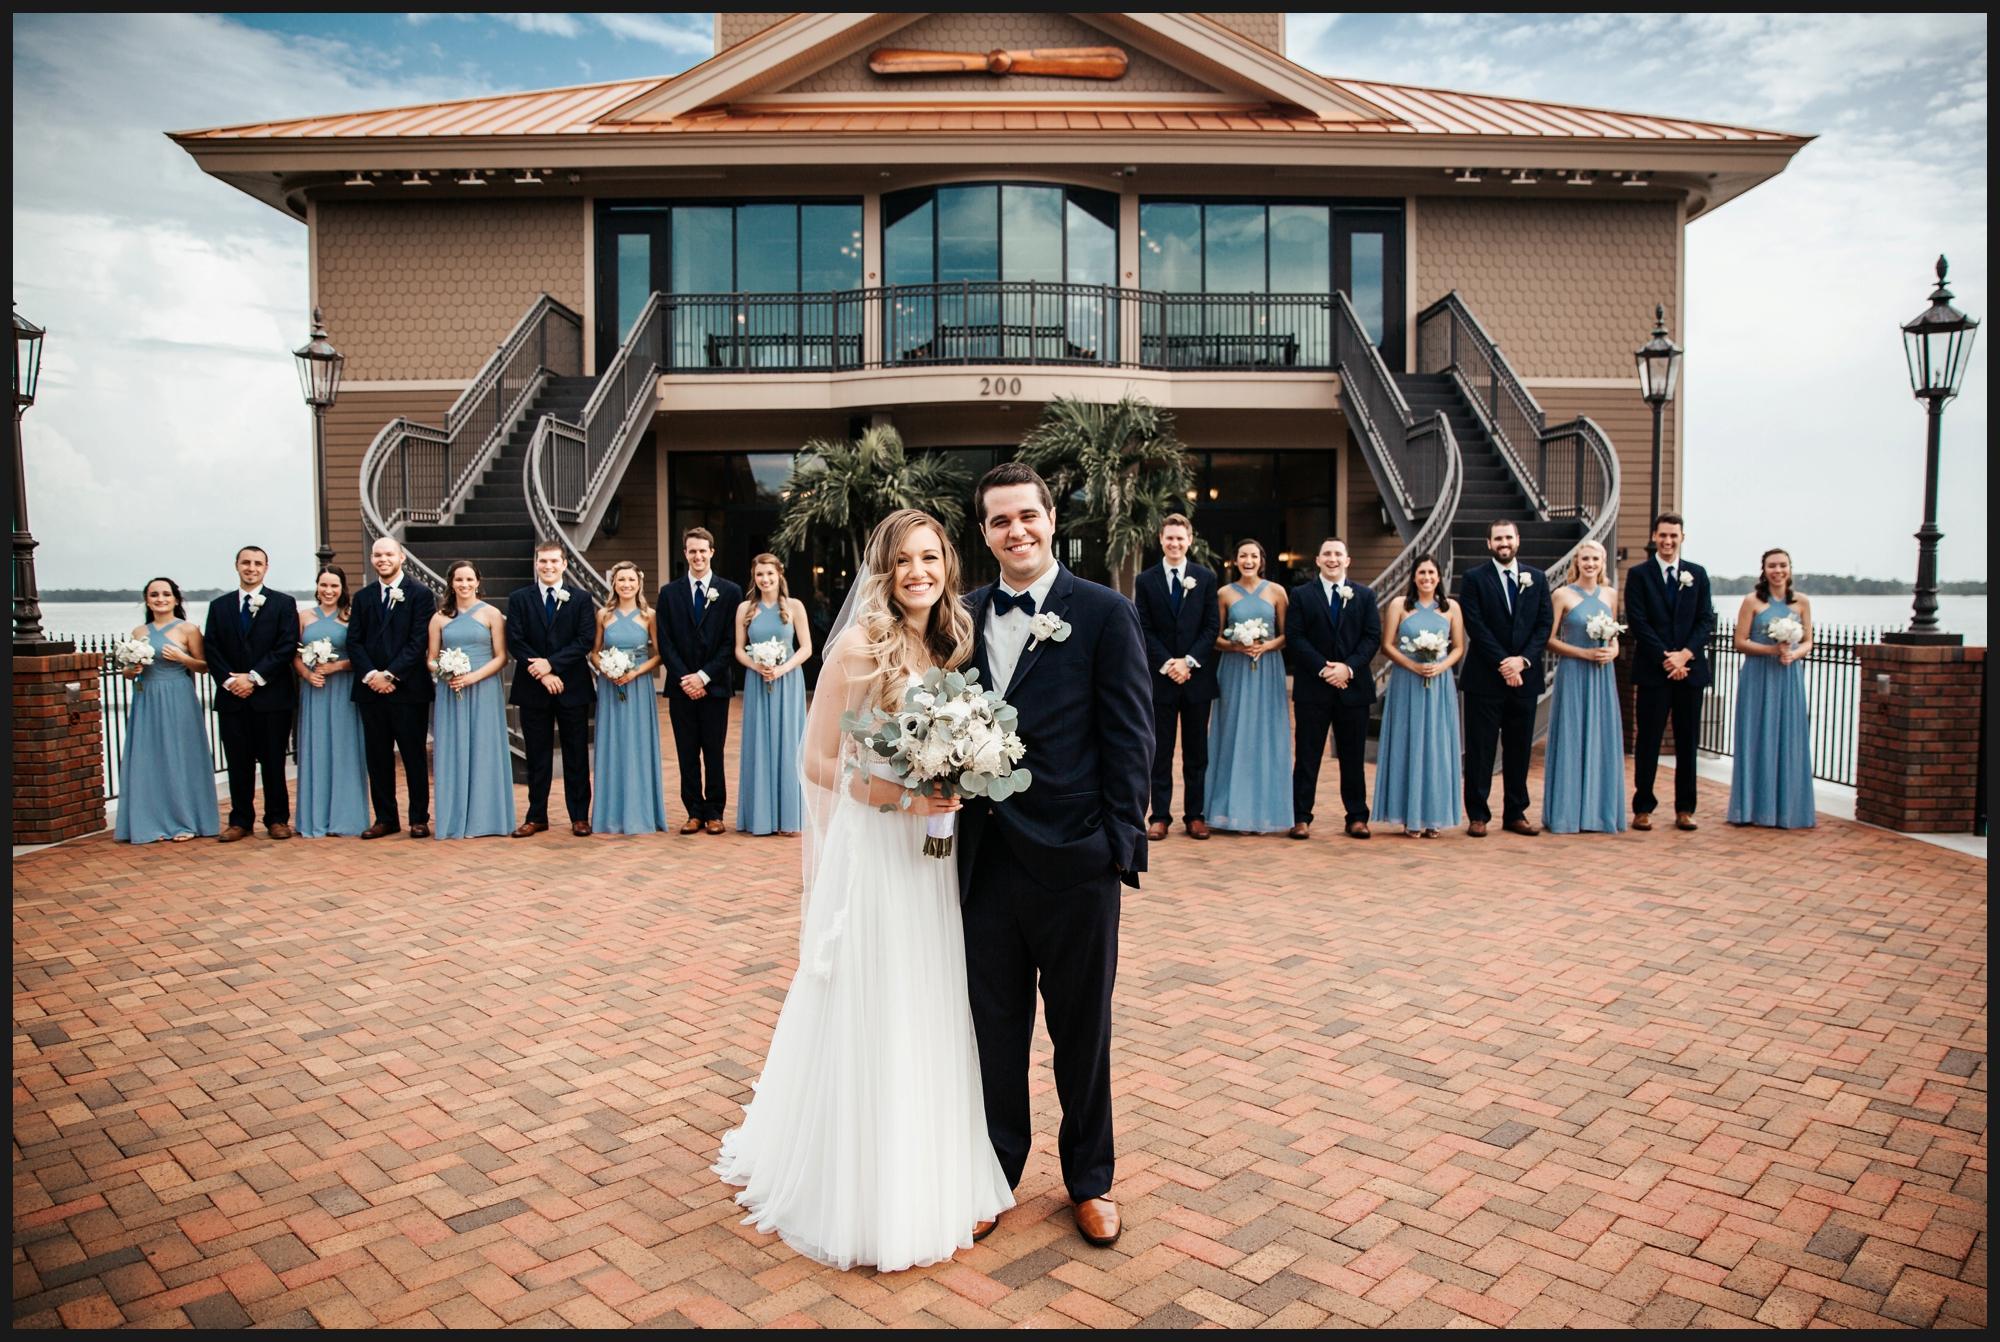 Orlando-Wedding-Photographer-destination-wedding-photographer-florida-wedding-photographer-bohemian-wedding-photographer_0278.jpg